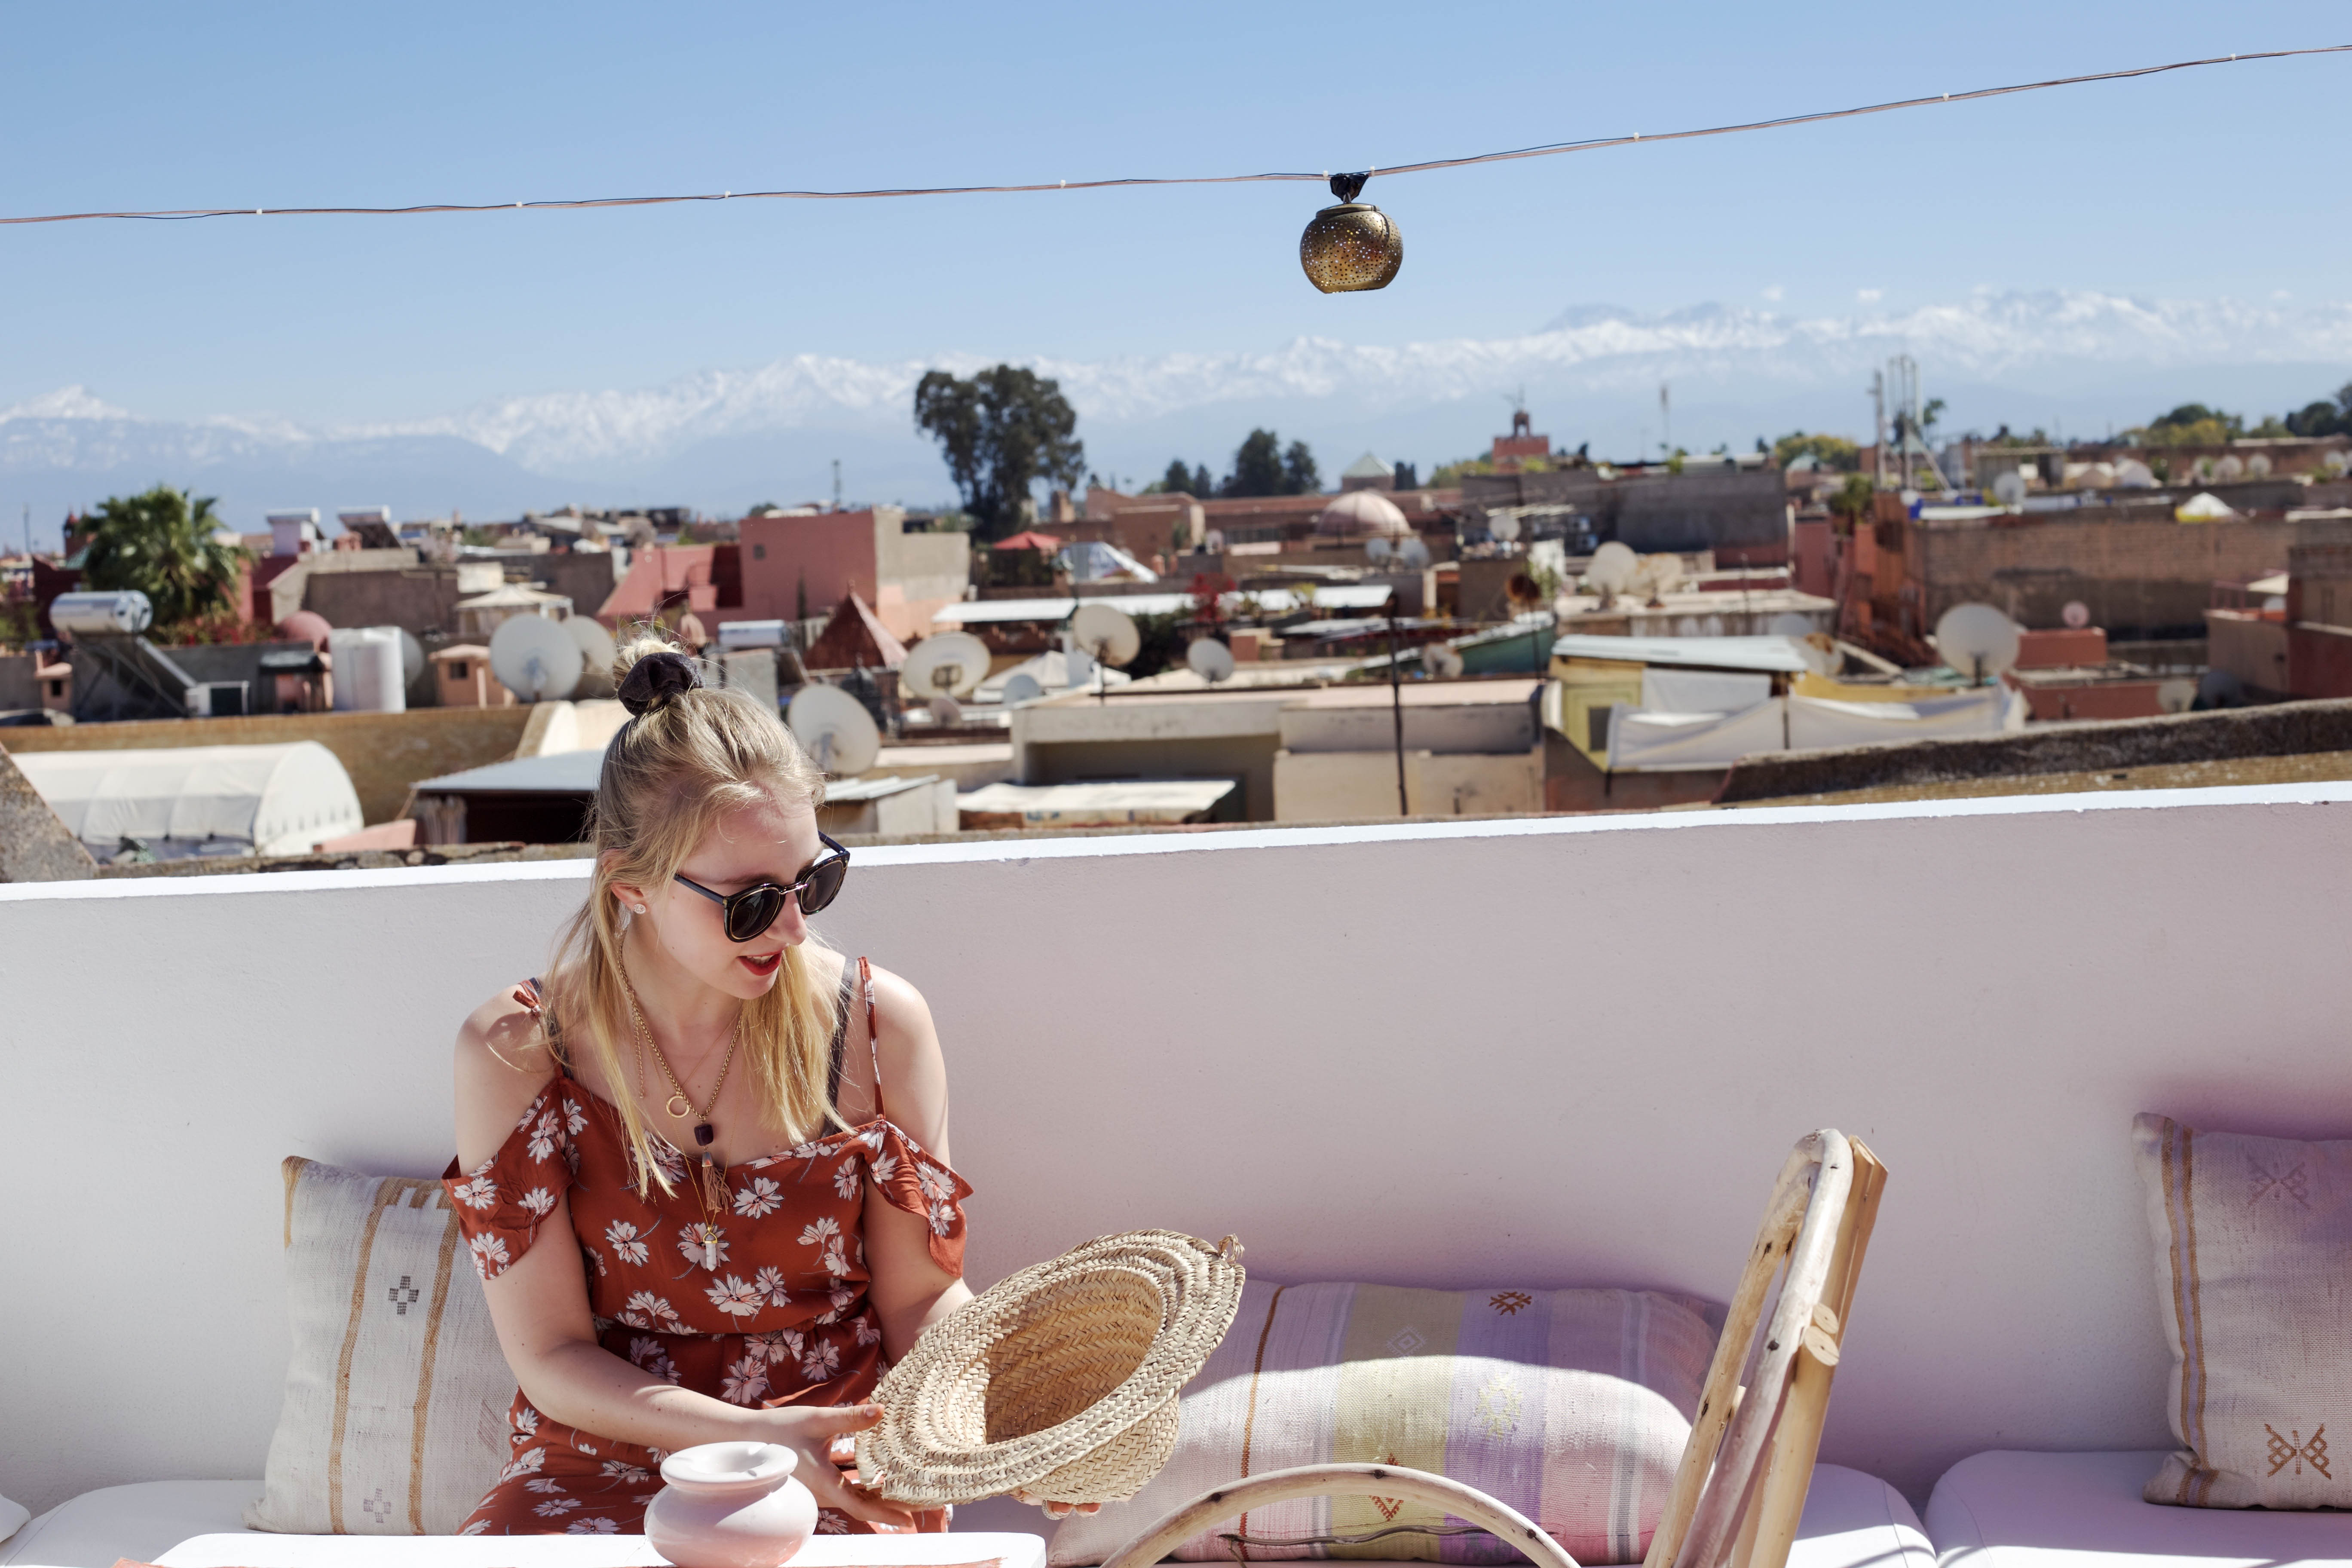 marrakech-traveldiary-tipps-fashionblog-reiseblog-sehenswüridgkeiten